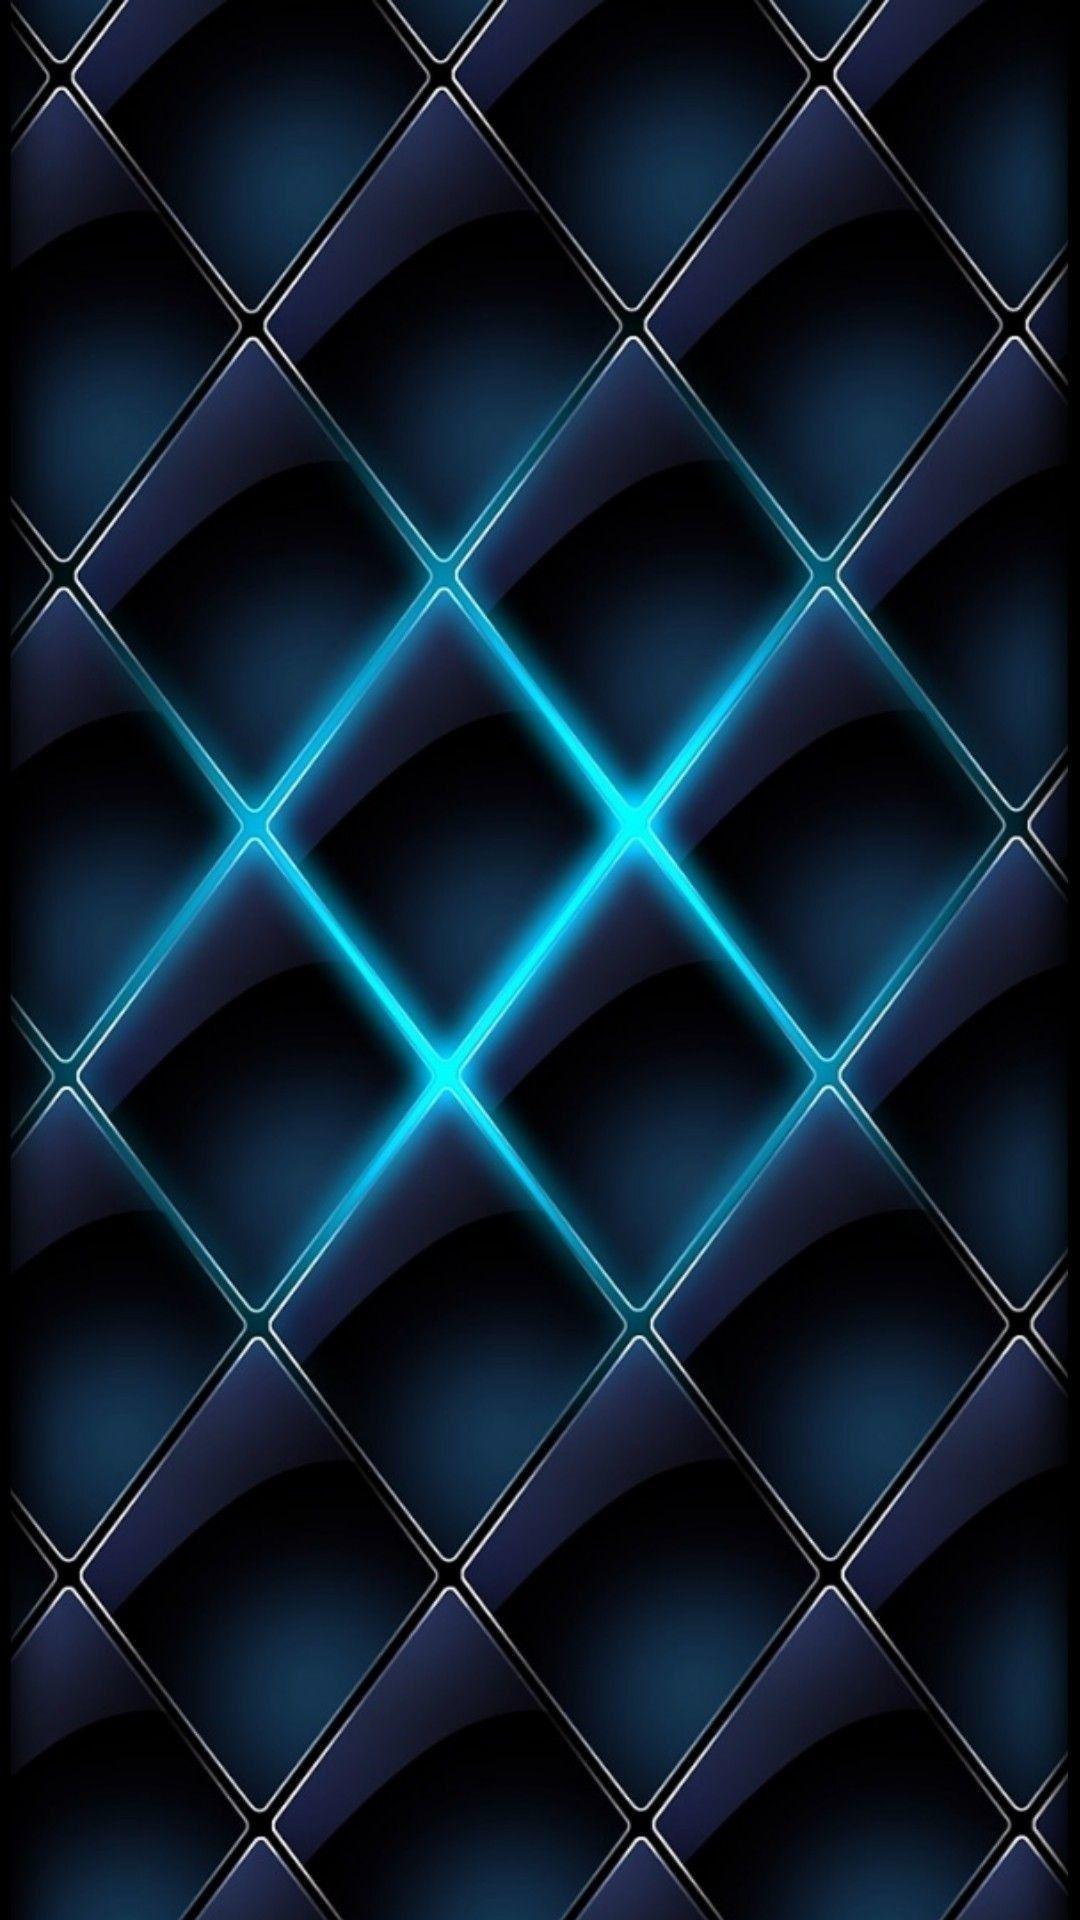 Black Neon Wallpaper Abstract